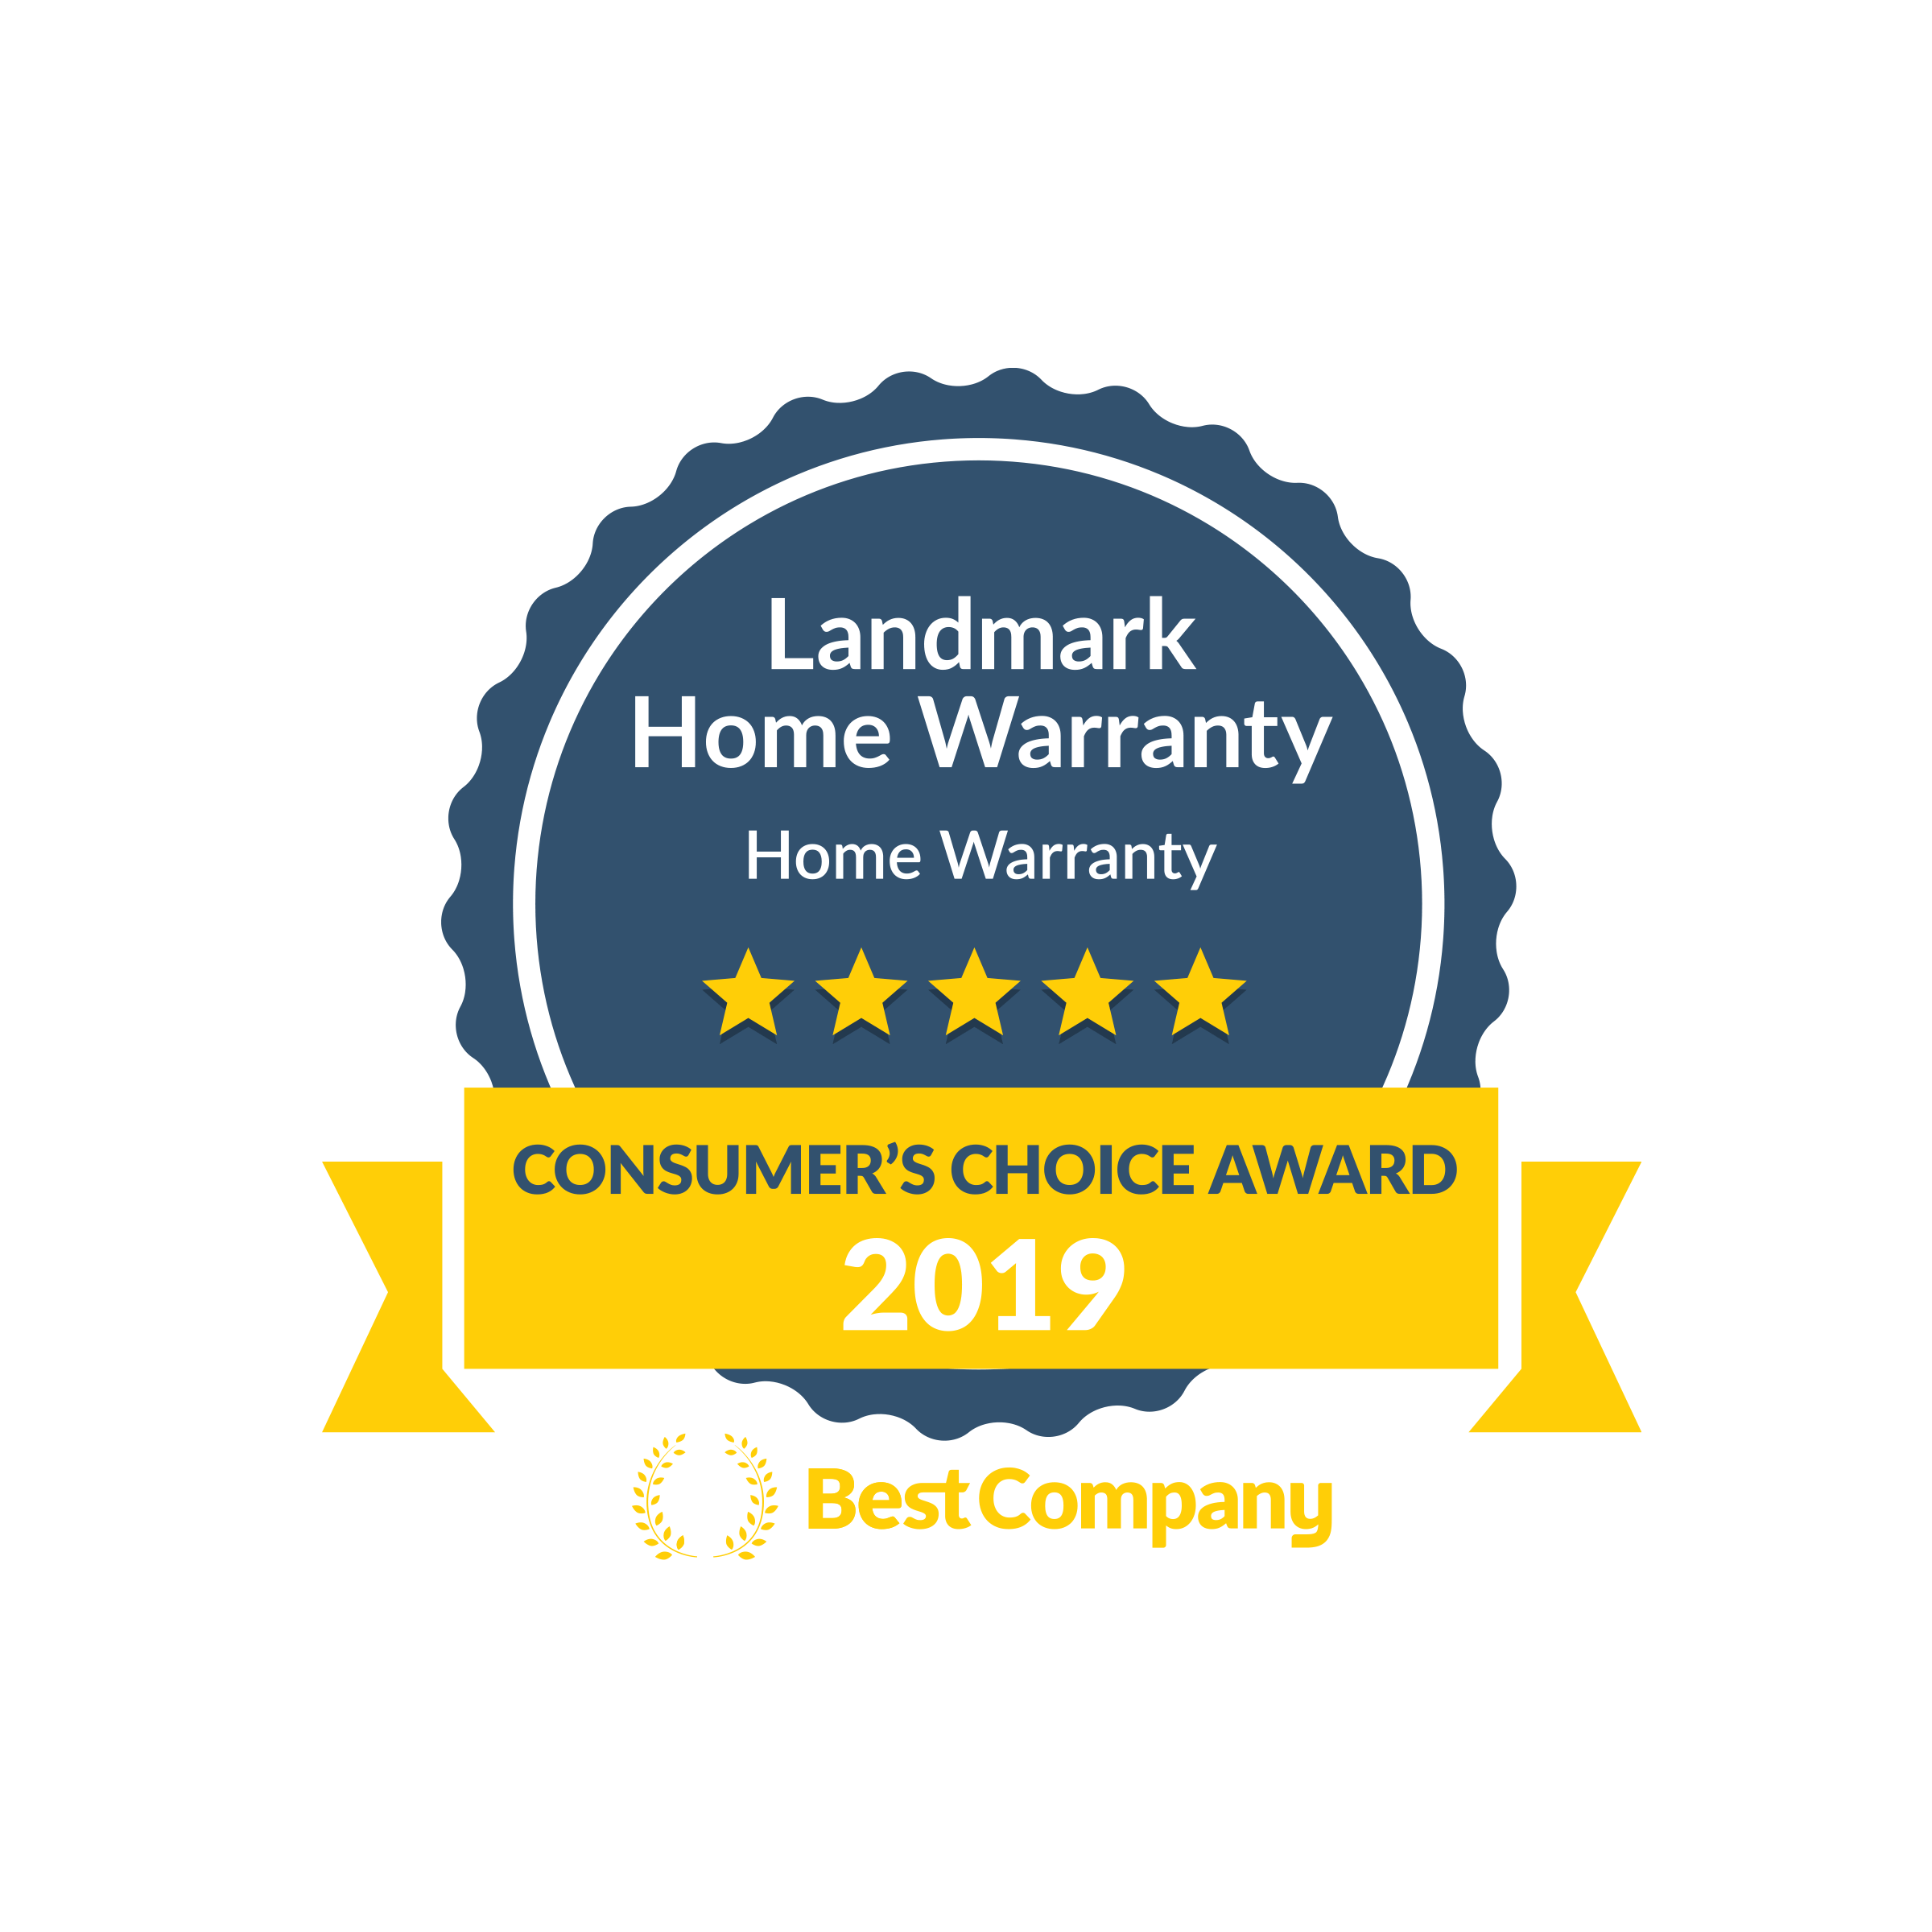 Home Warranty Service Provider Landmark Home Warranty